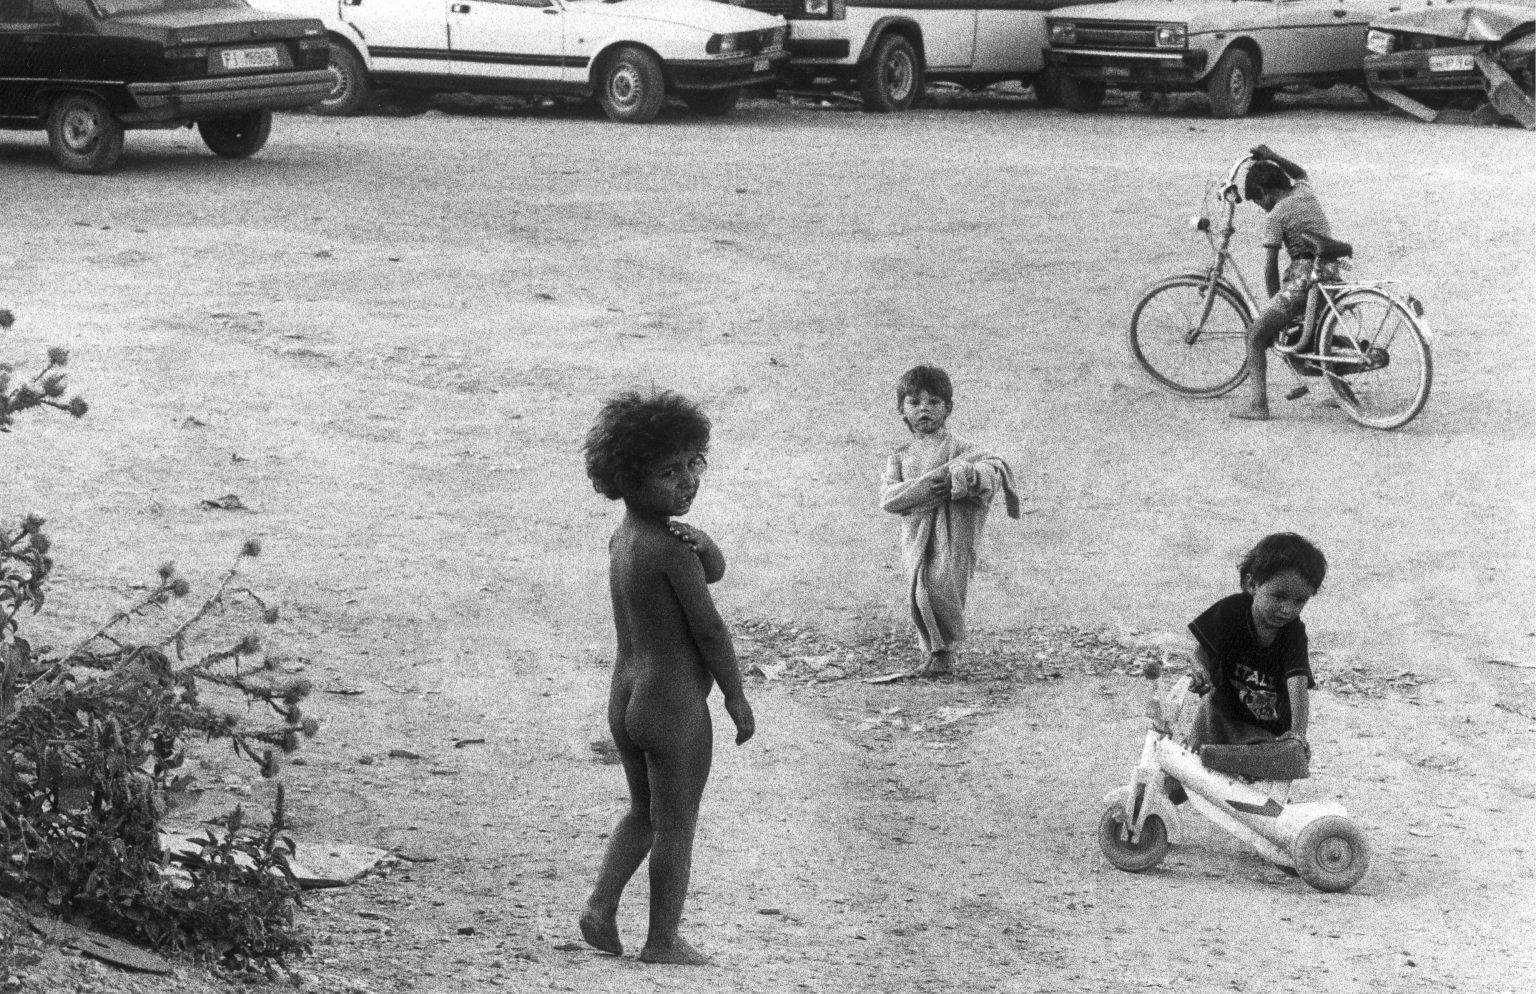 FIRENZE 1993 - CAMPO NOMADI. FLORENCE 1993 - NOMADS CAMP.